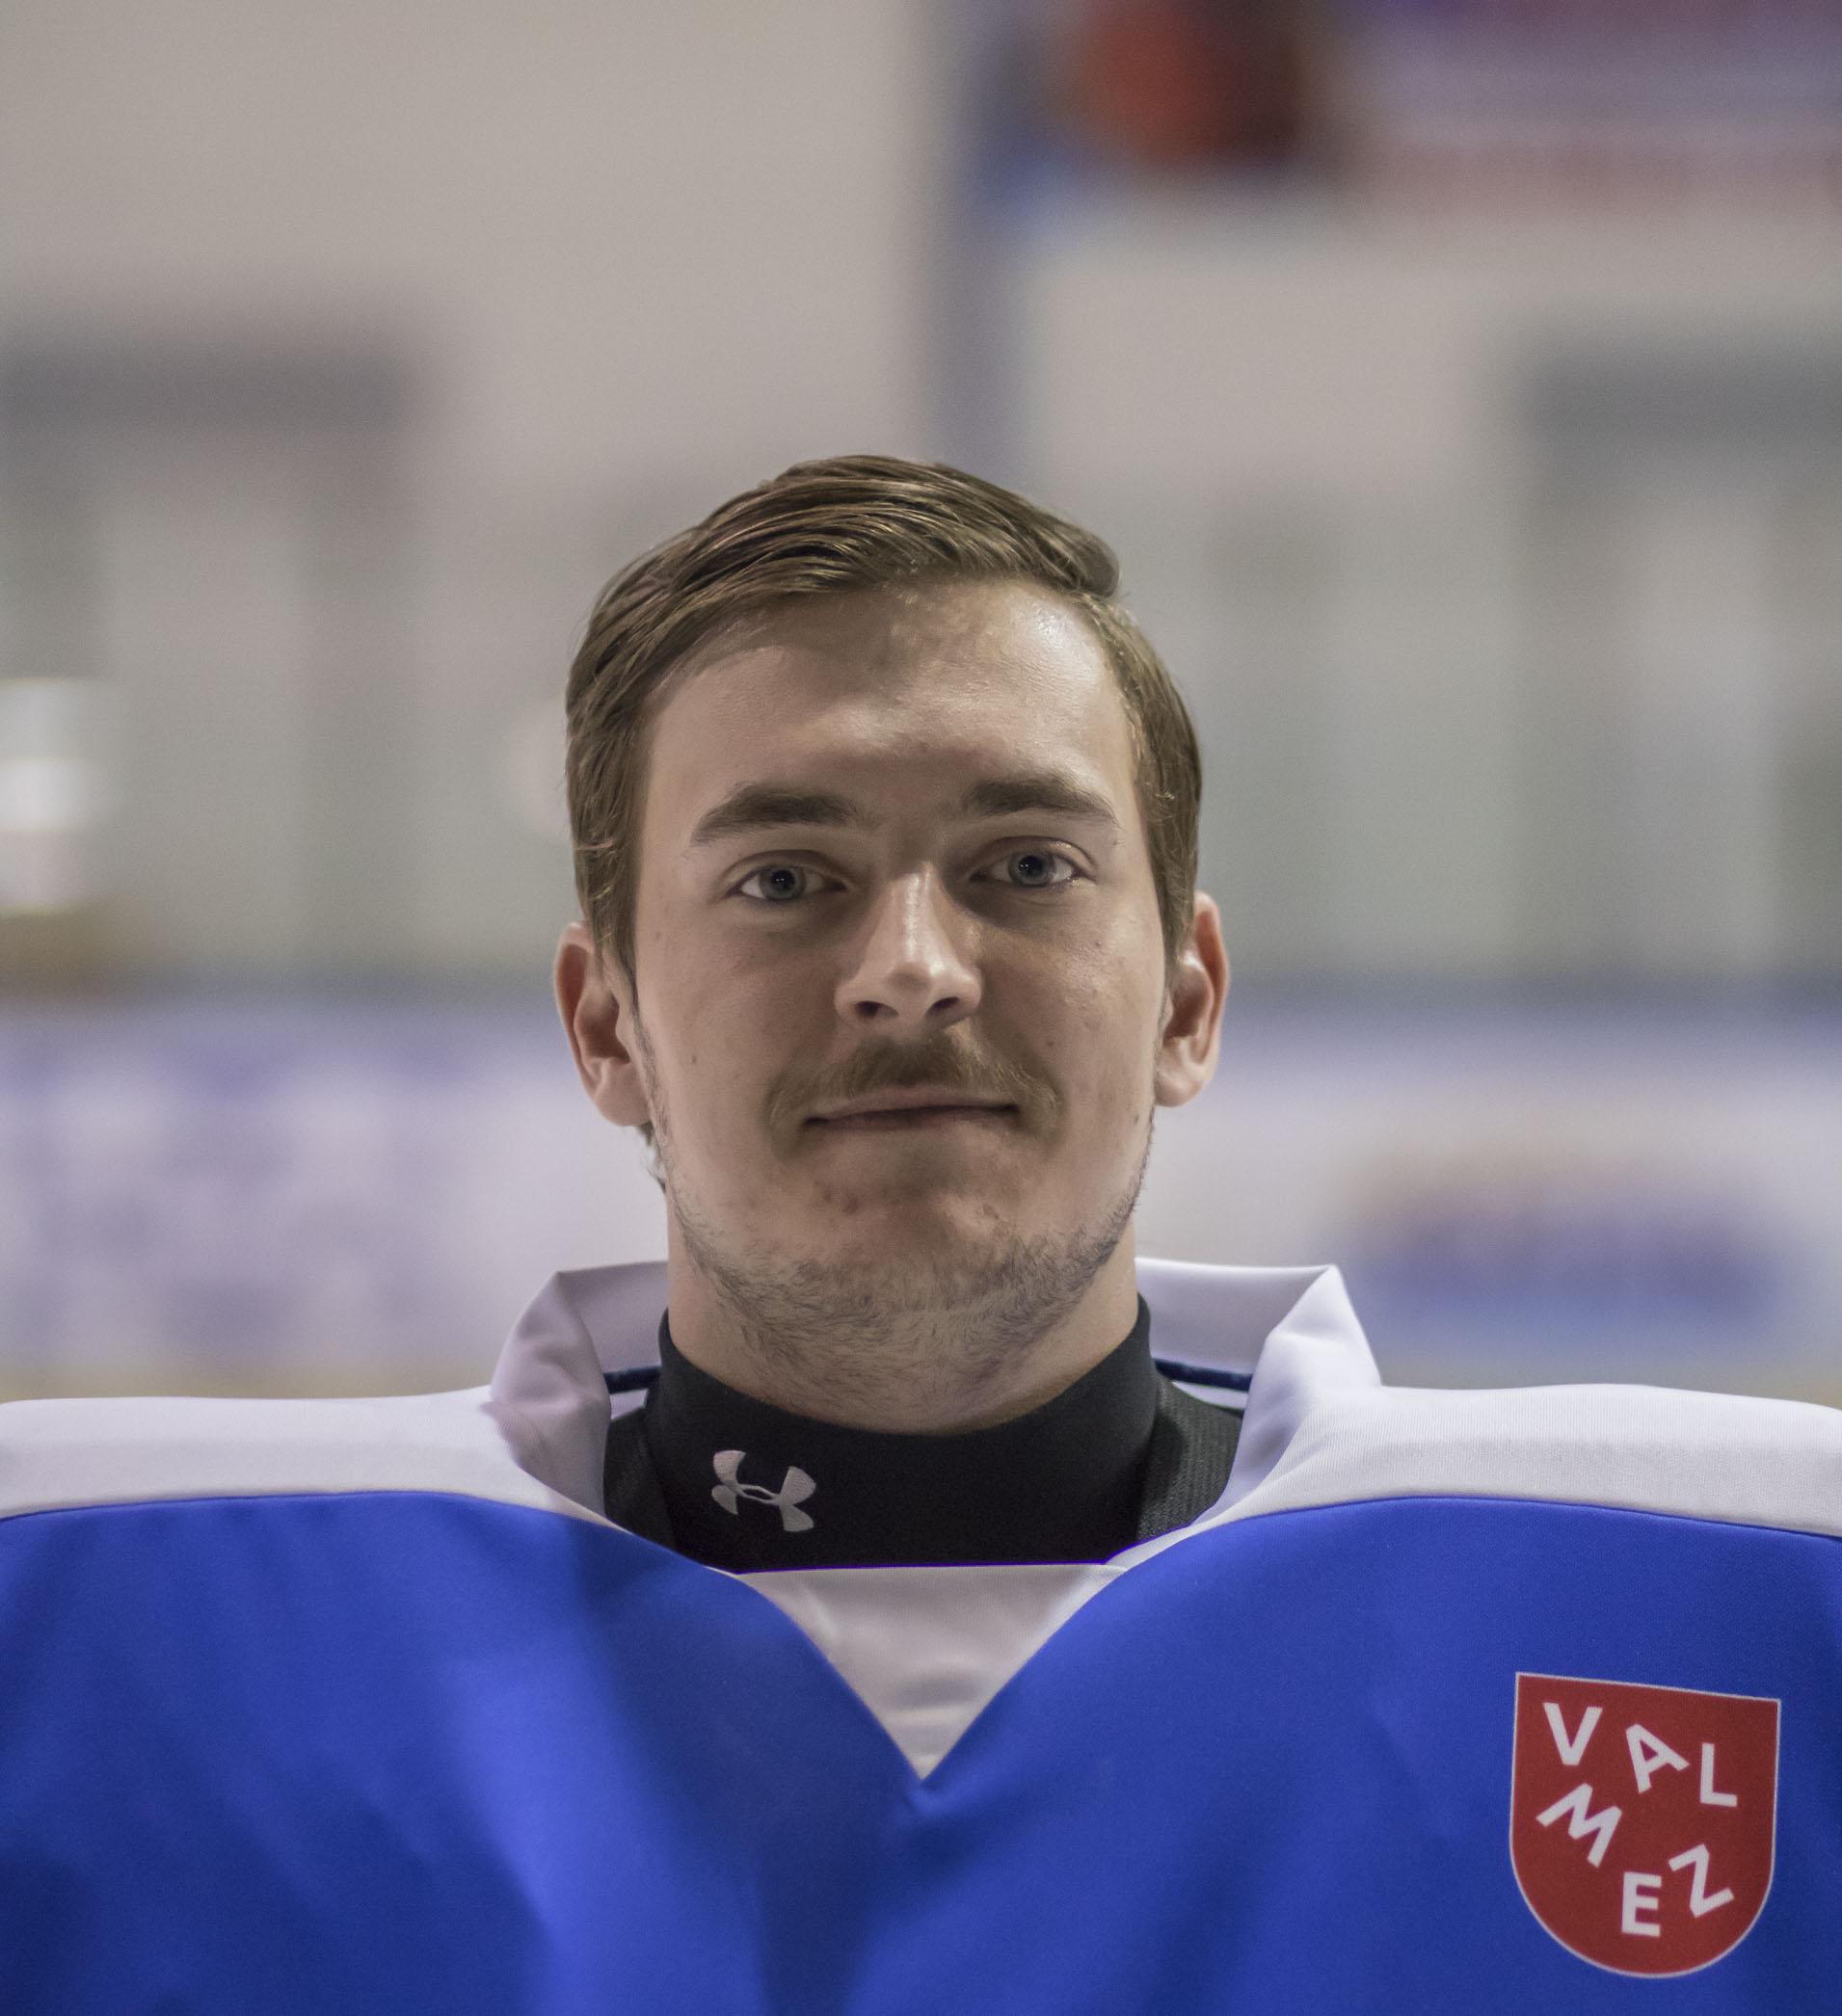 Marek Netolièka #30